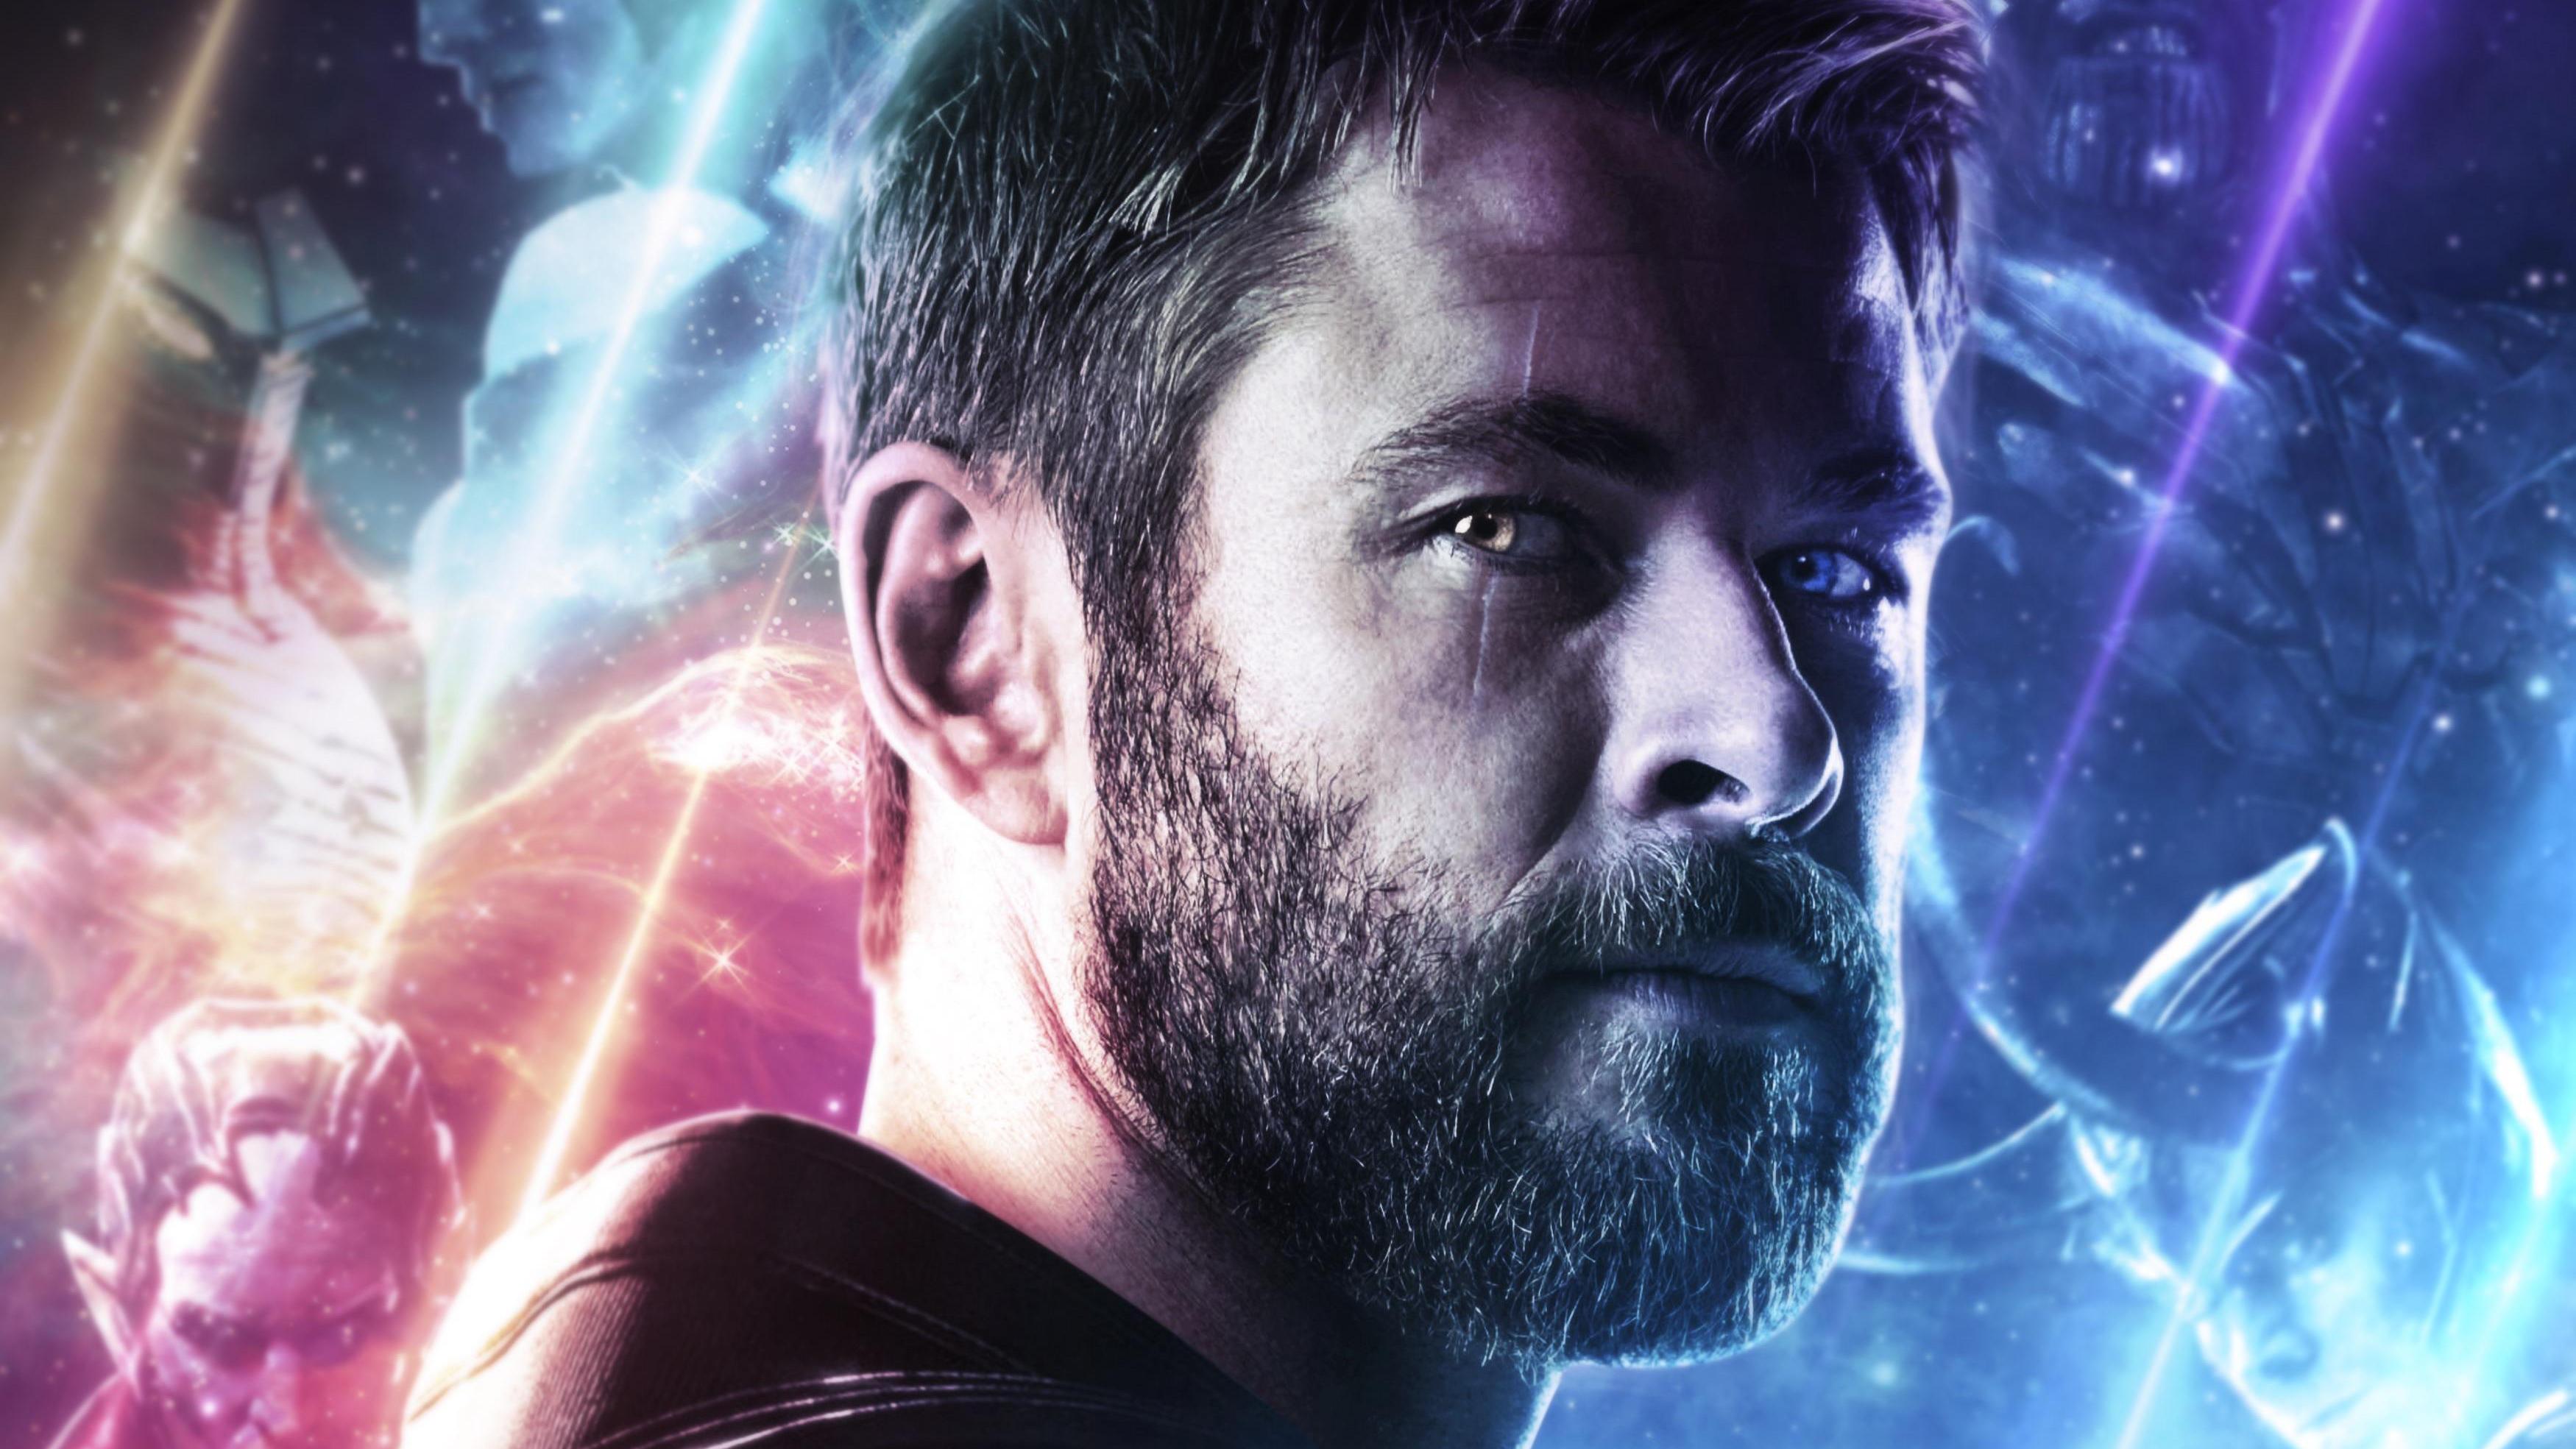 Thor Avengers Endgame 4k New, HD Superheroes, 4k ...